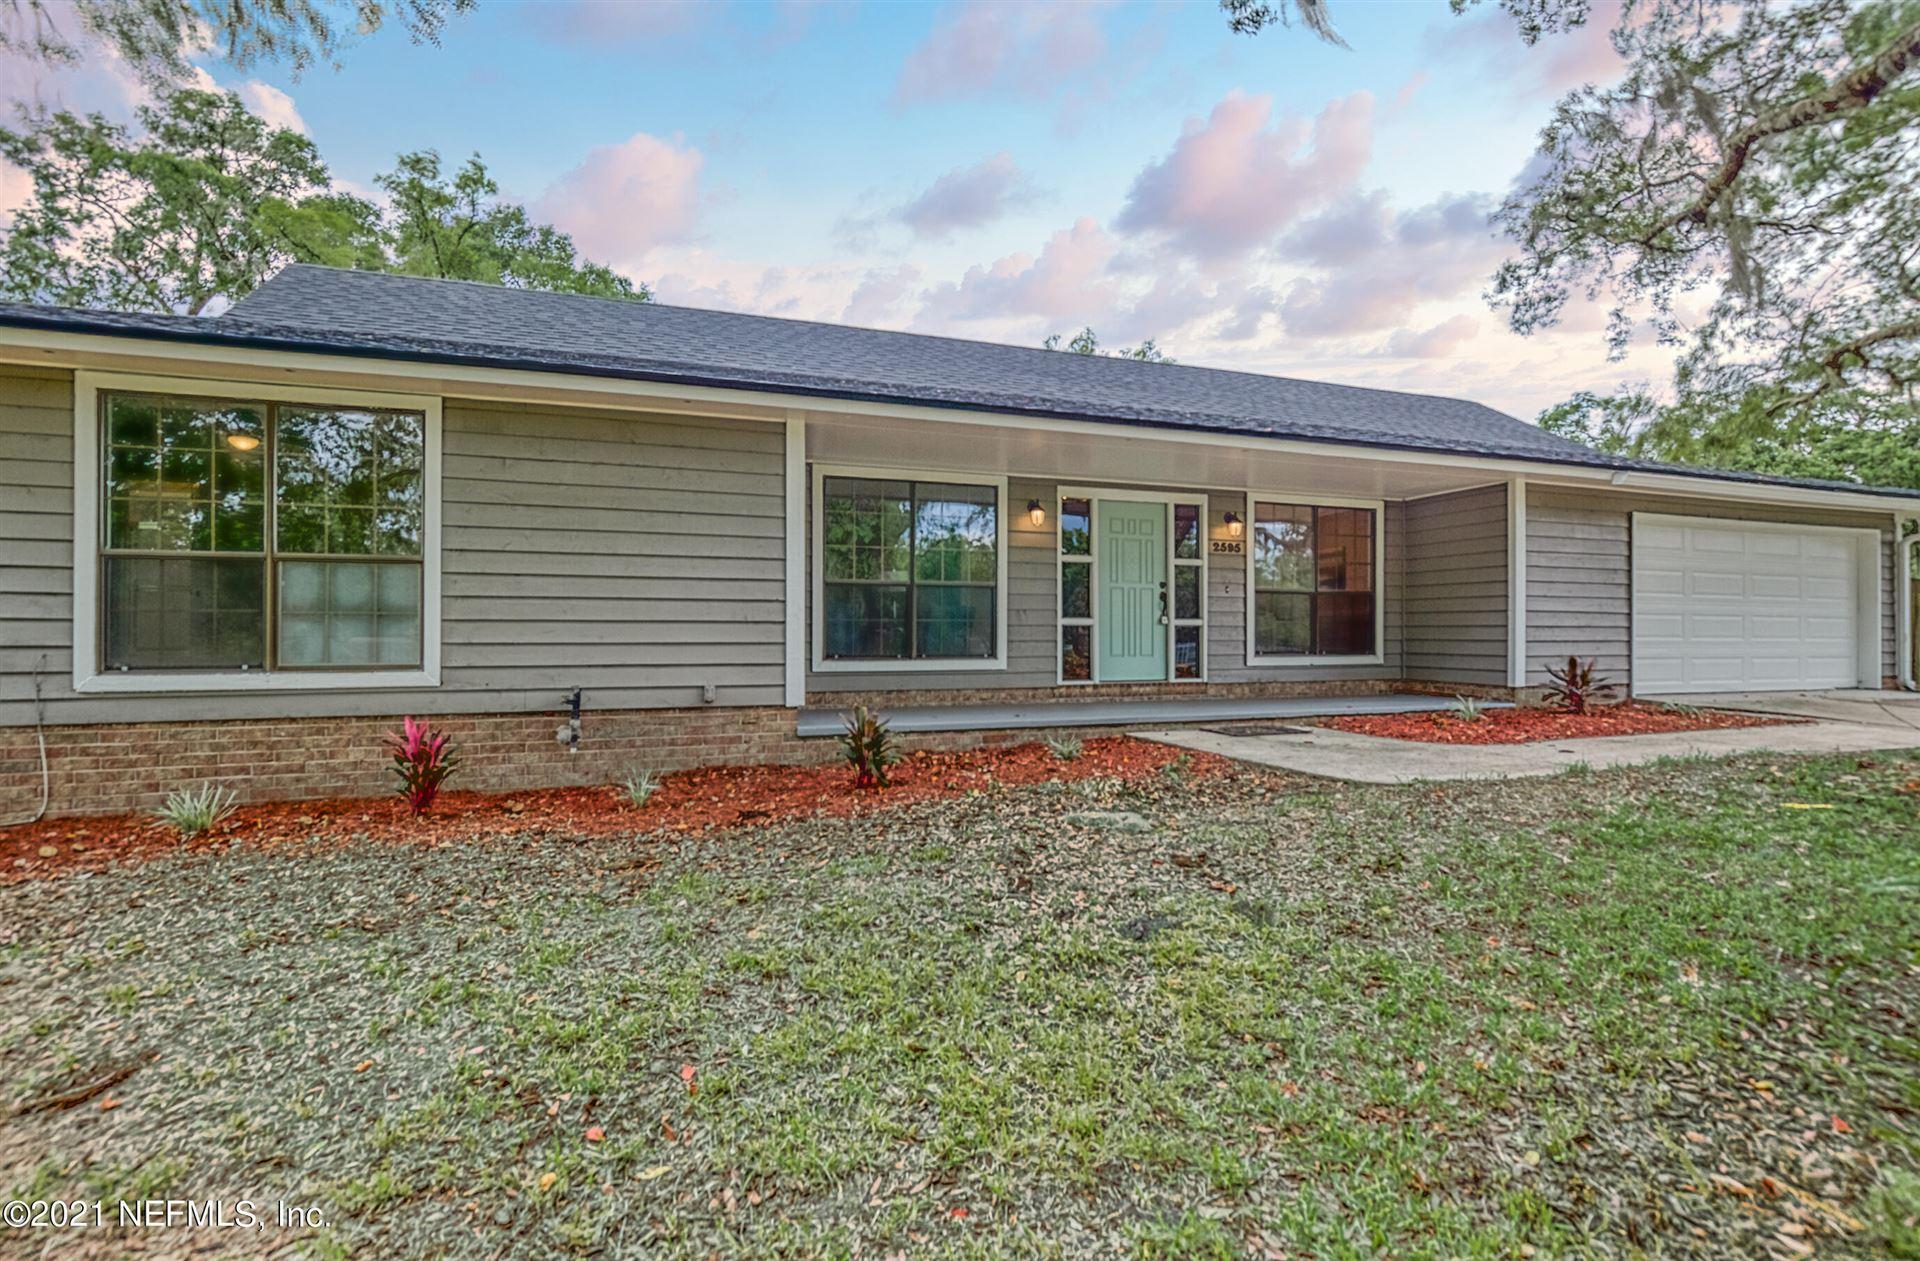 2595 BOTTOMRIDGE DR, Orange Park, FL 32065 - MLS#: 1122023